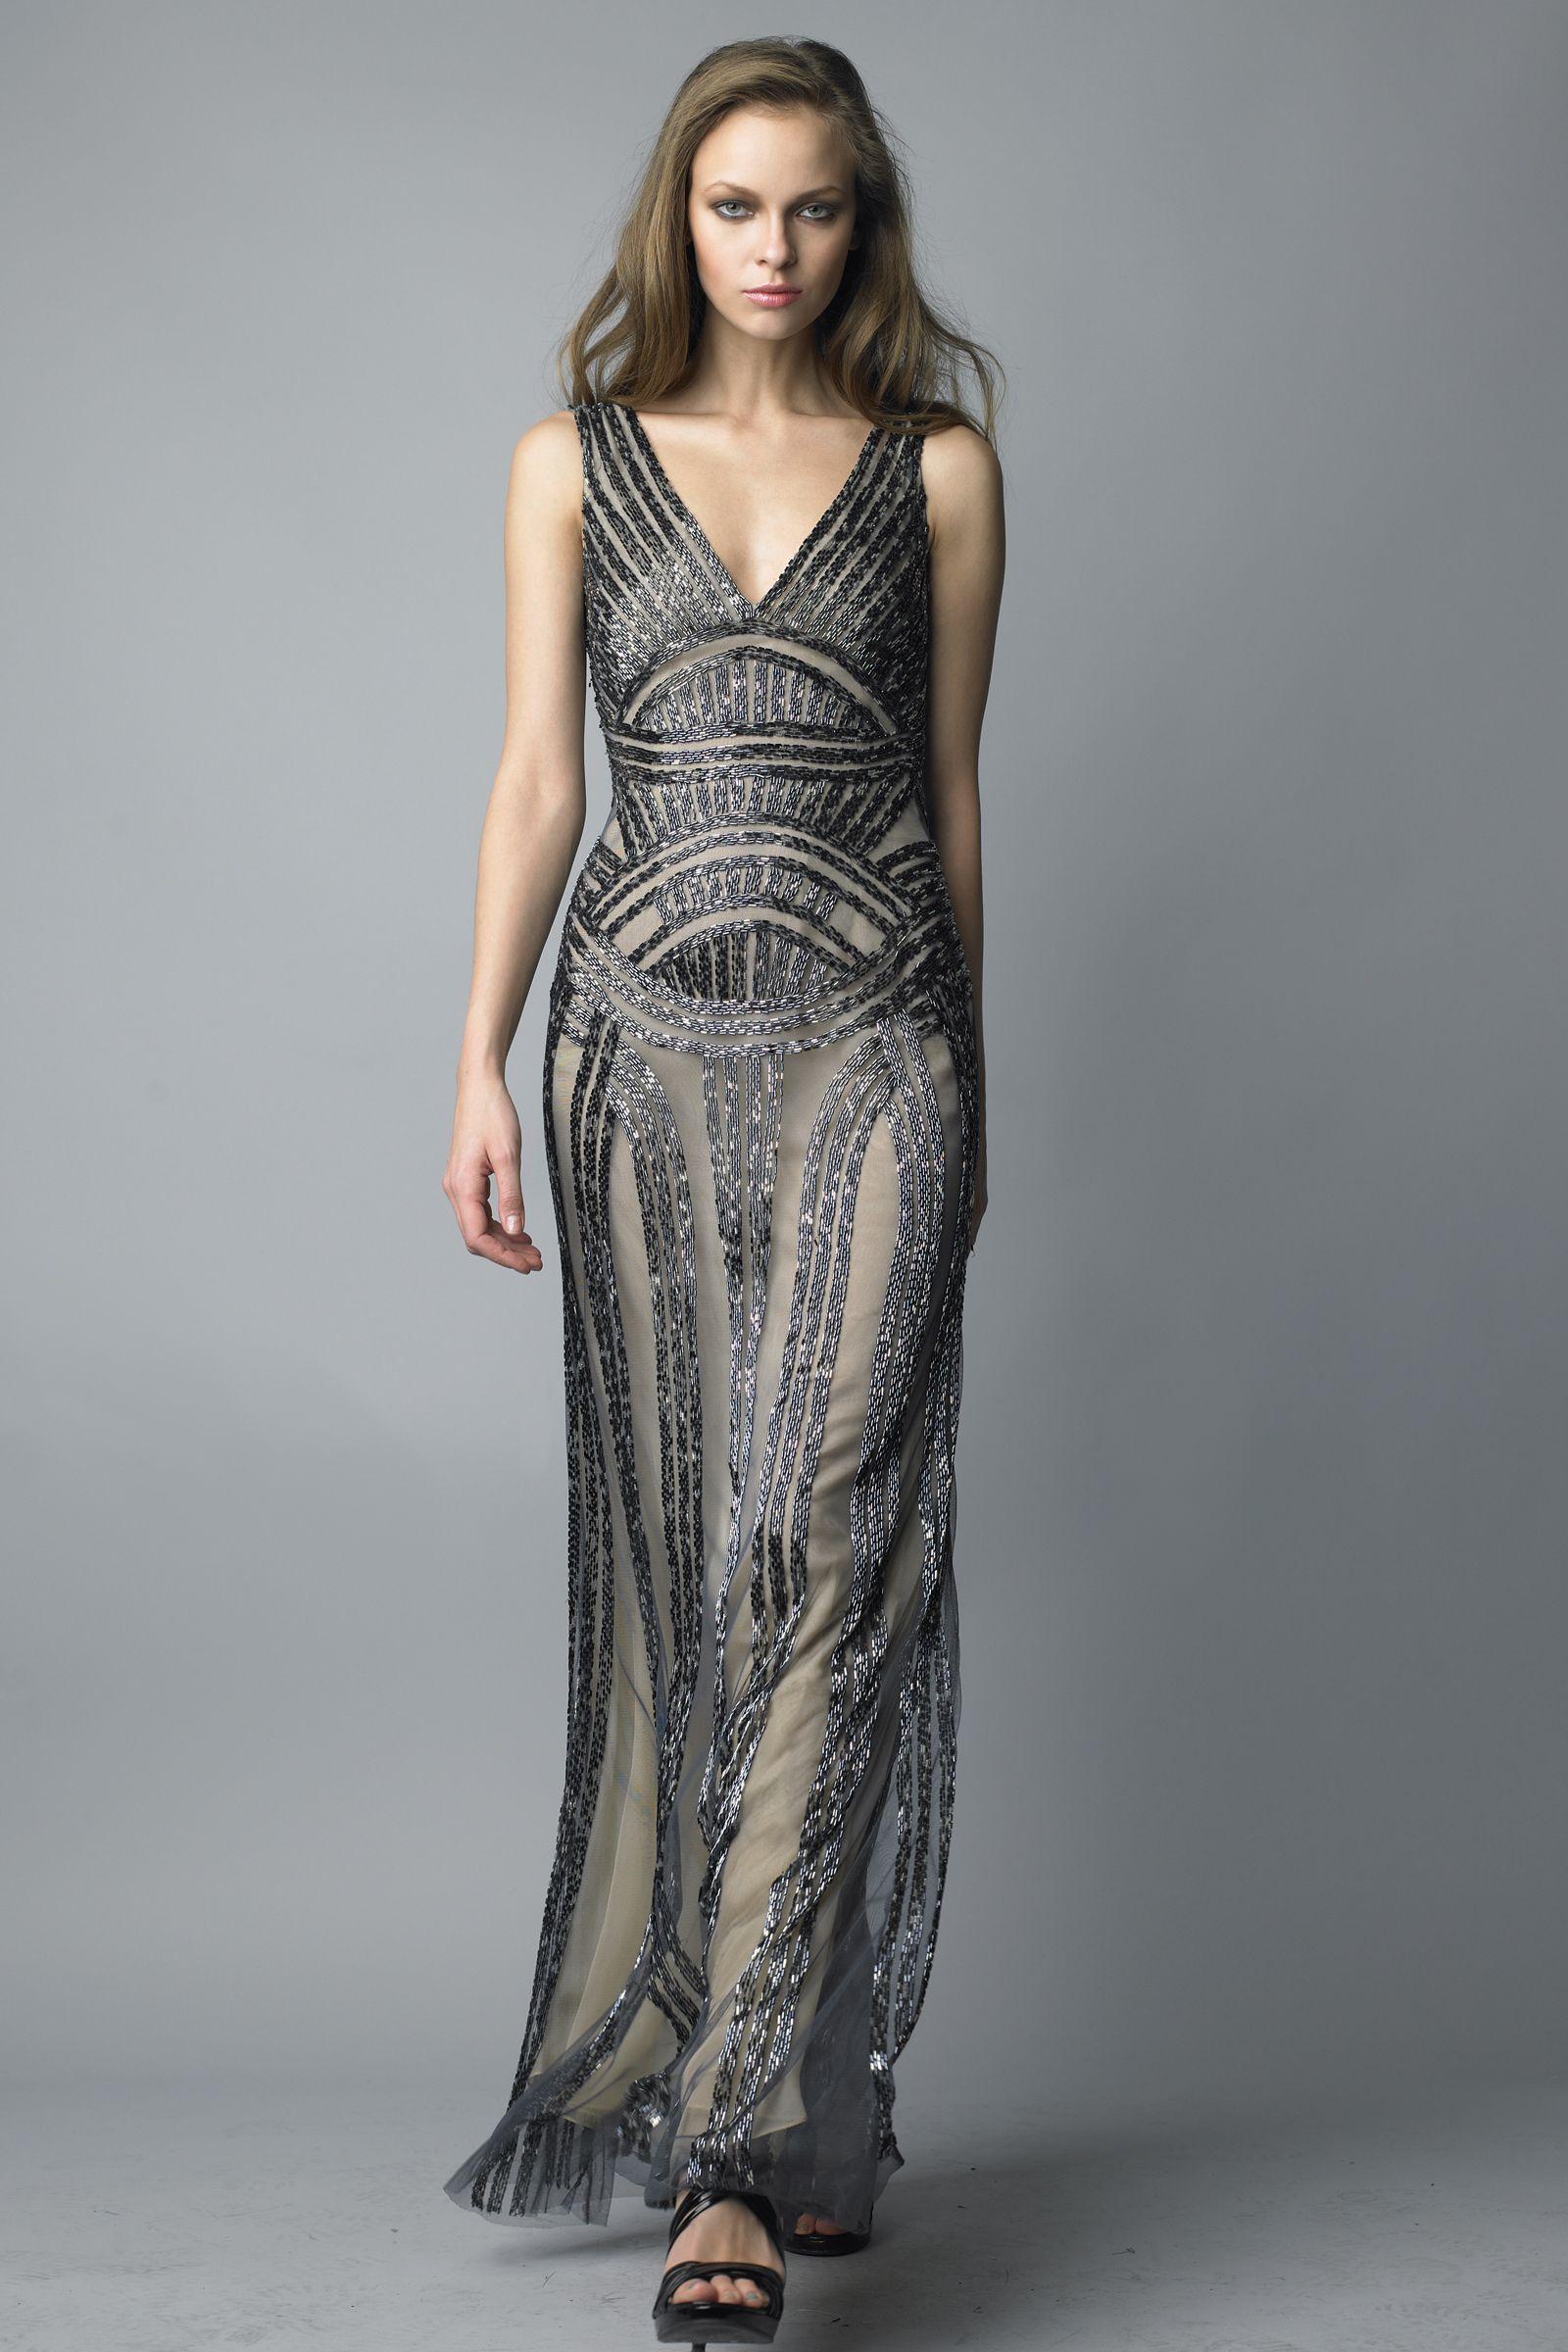 Art Deco Evening Gowns | Art Deco Dress Basix black label - d6077lss ...